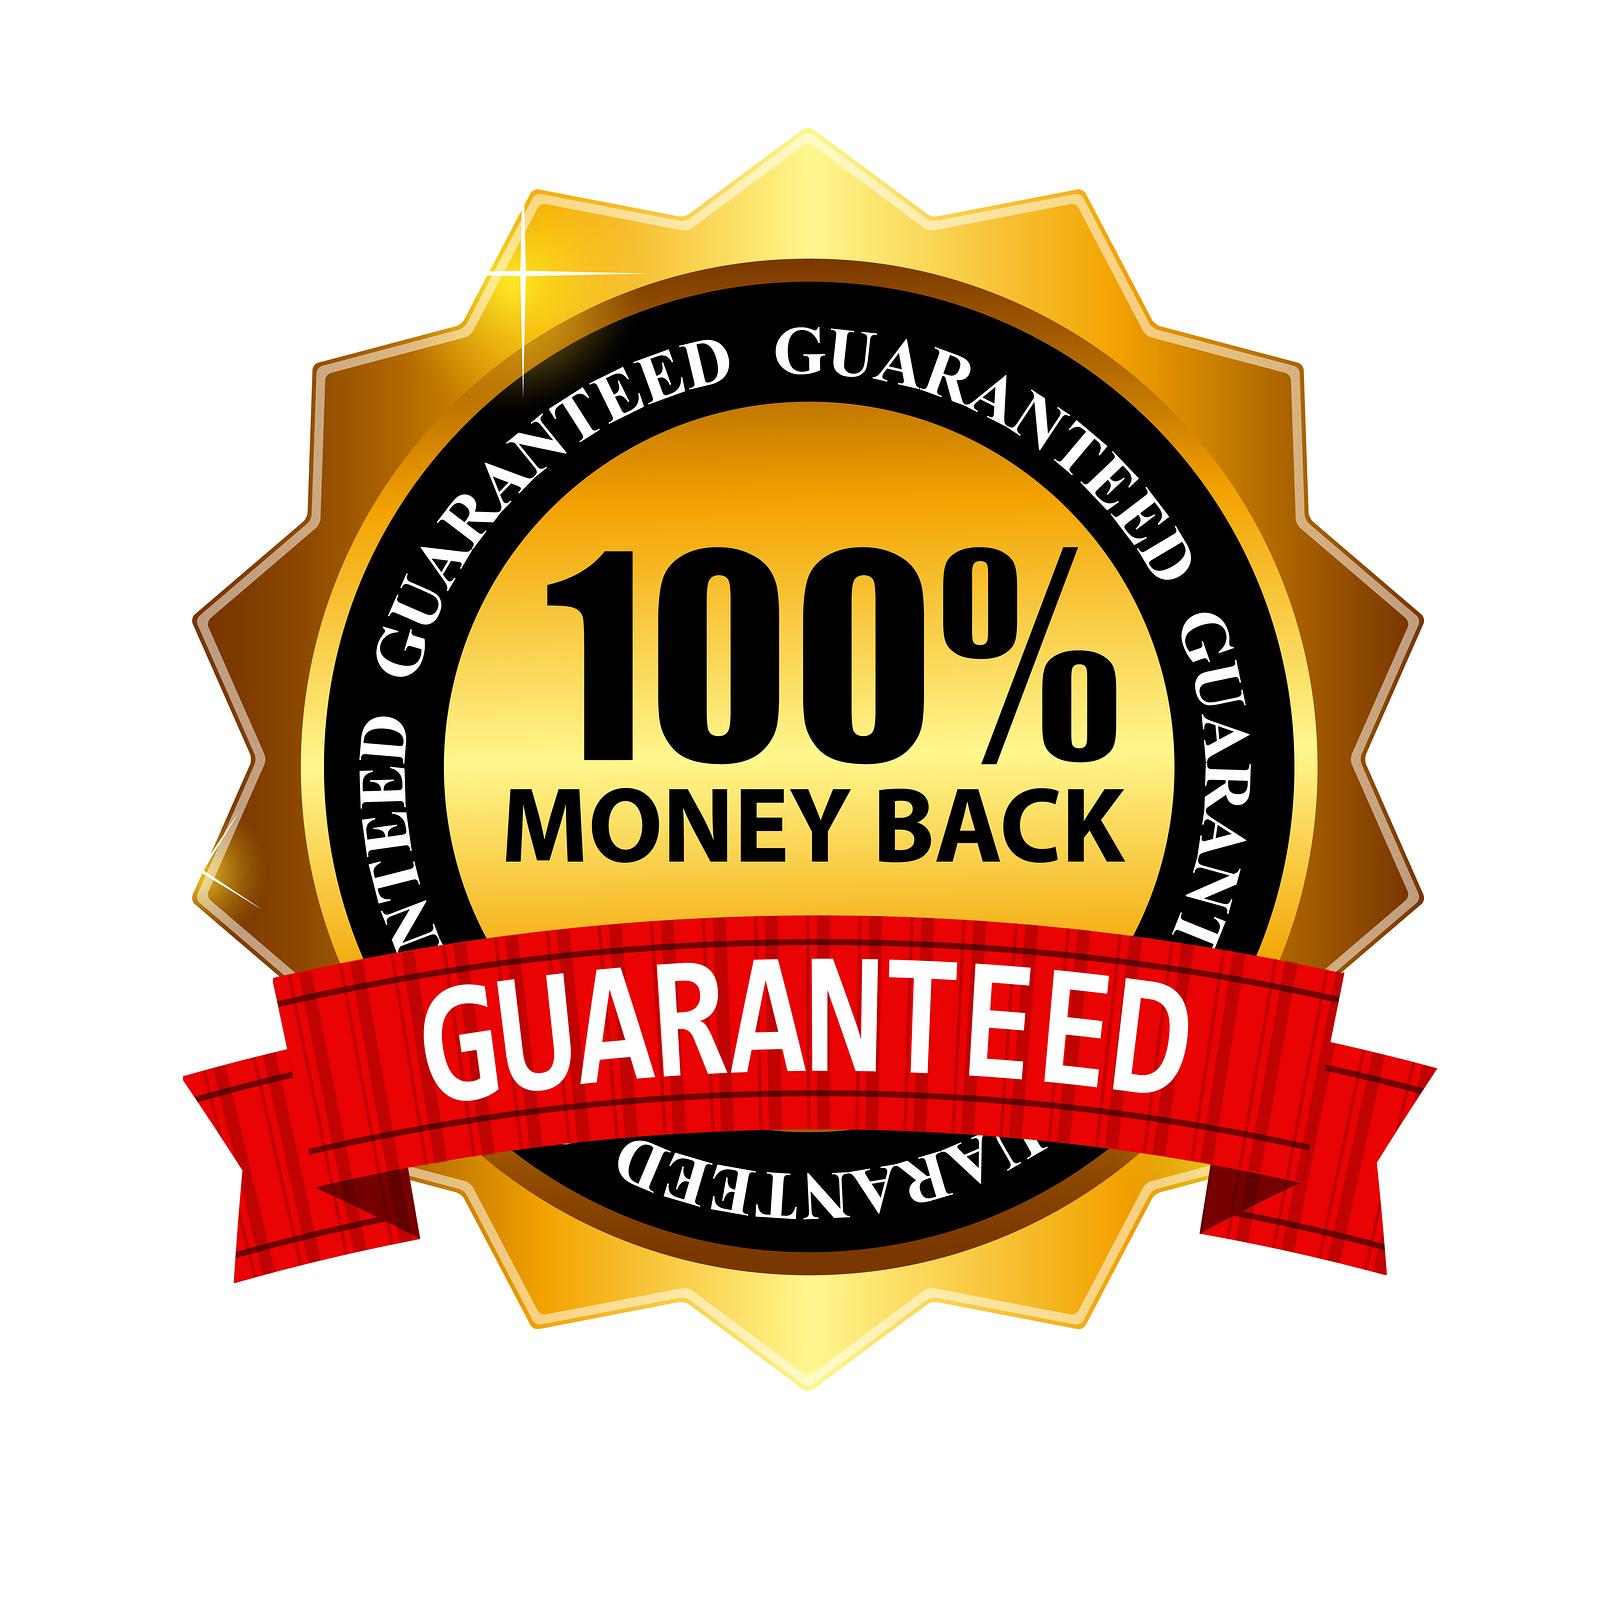 Zzlp5ryryip8gijzzxka money back guarantee seal